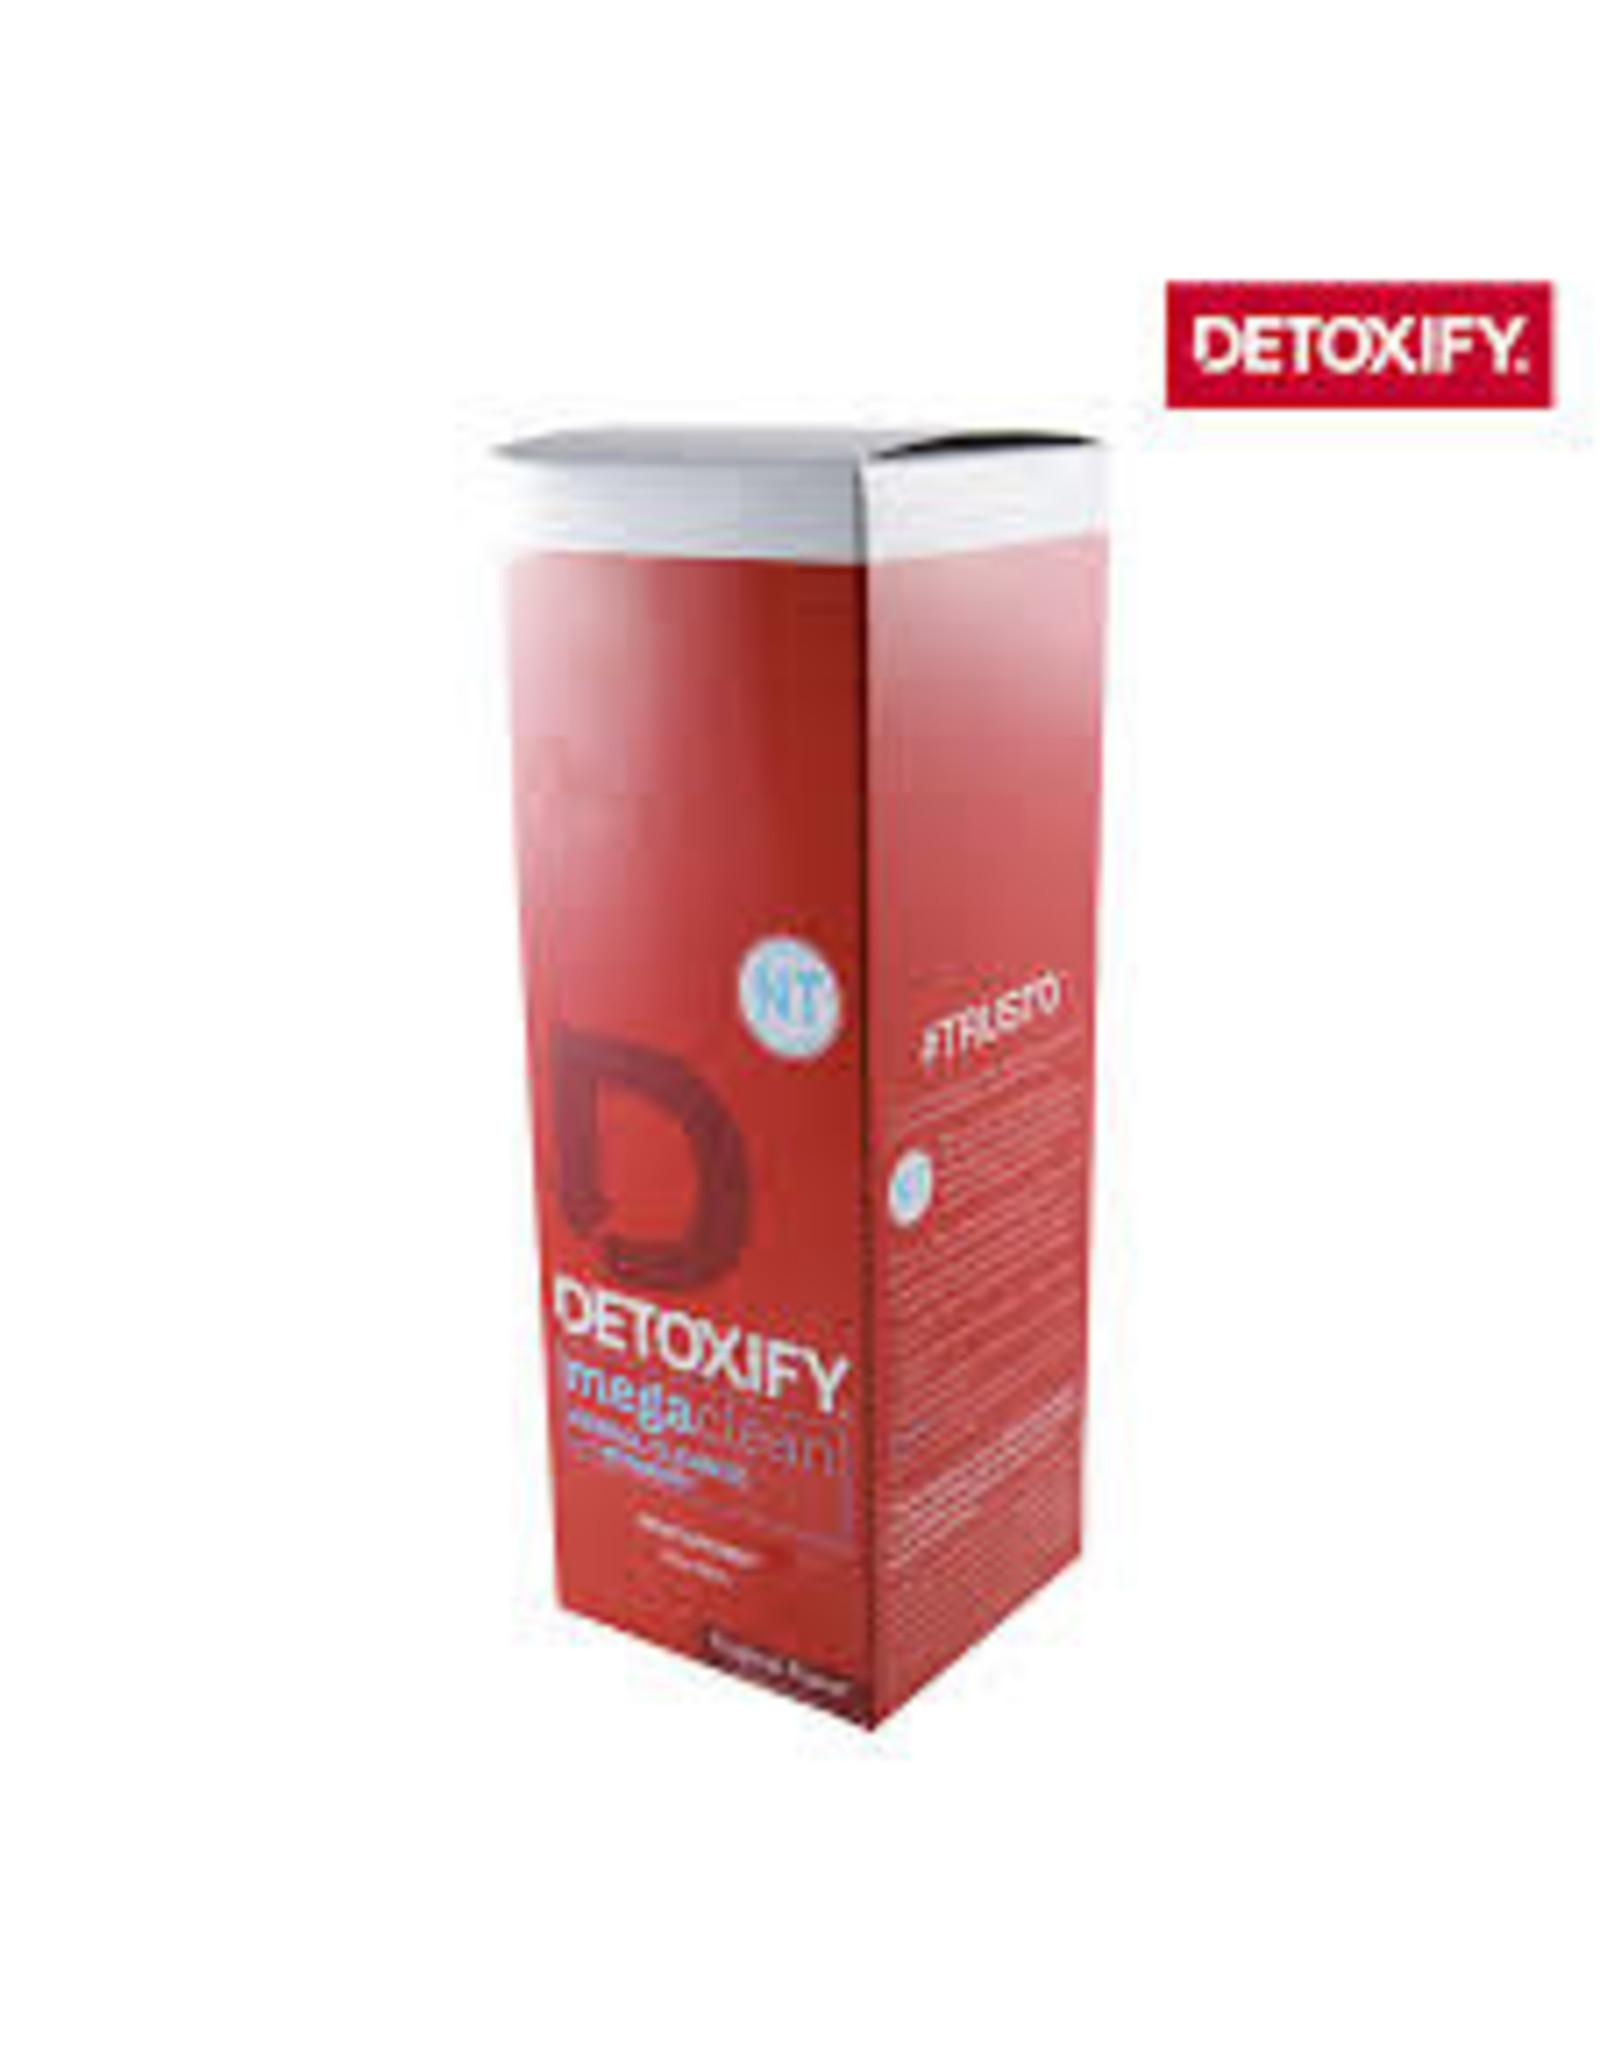 DETOXIFY DETOXIFY MEGA CLEAN With boost NT  – TROPICAL 32oz